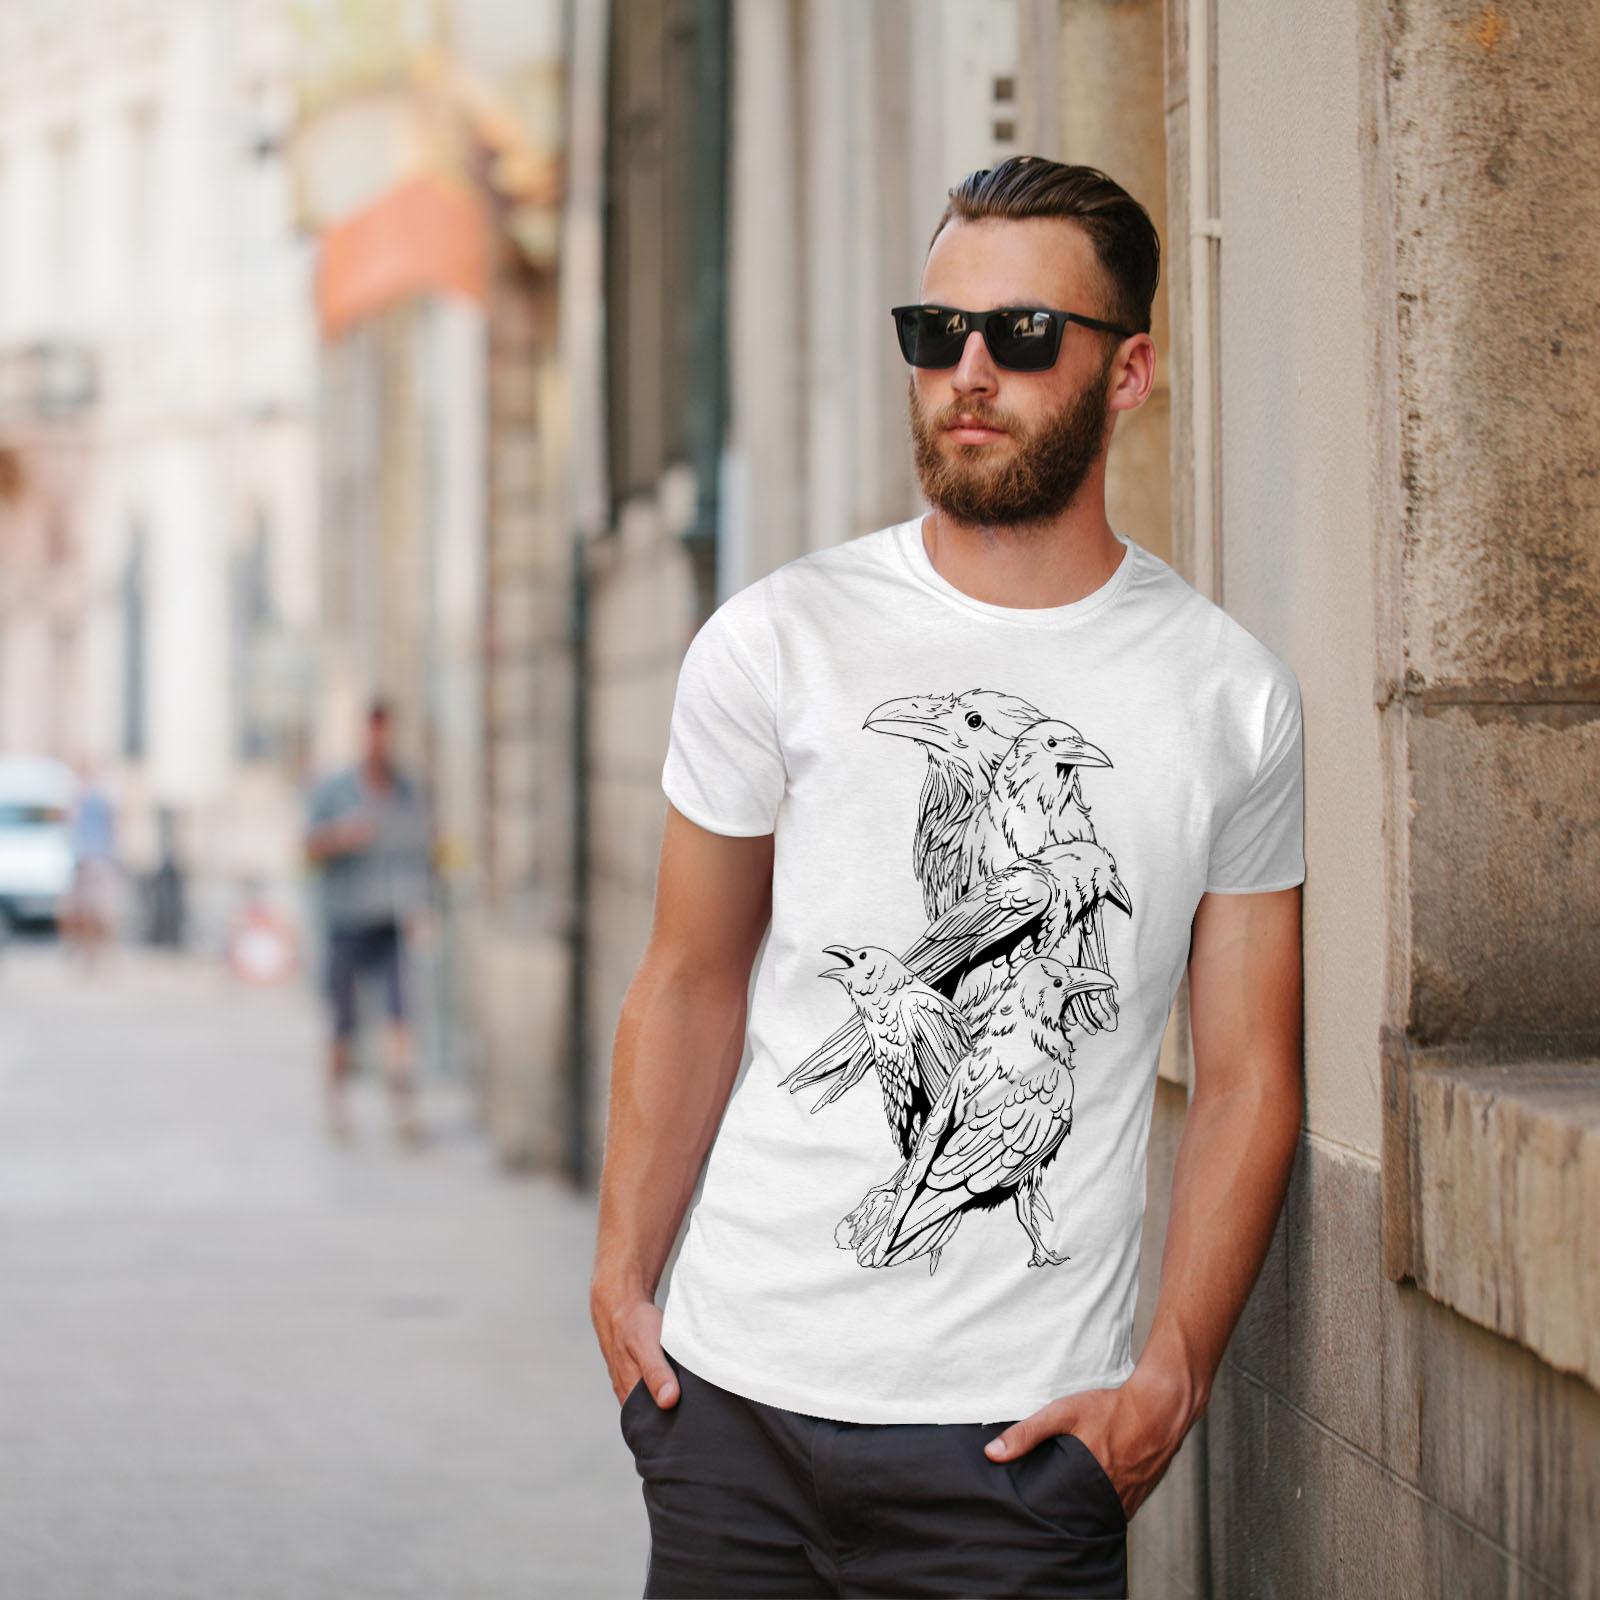 miniature 11 - Wellcoda Four Scary Raven Mens T-shirt, Crow Birds Graphic Design Printed Tee